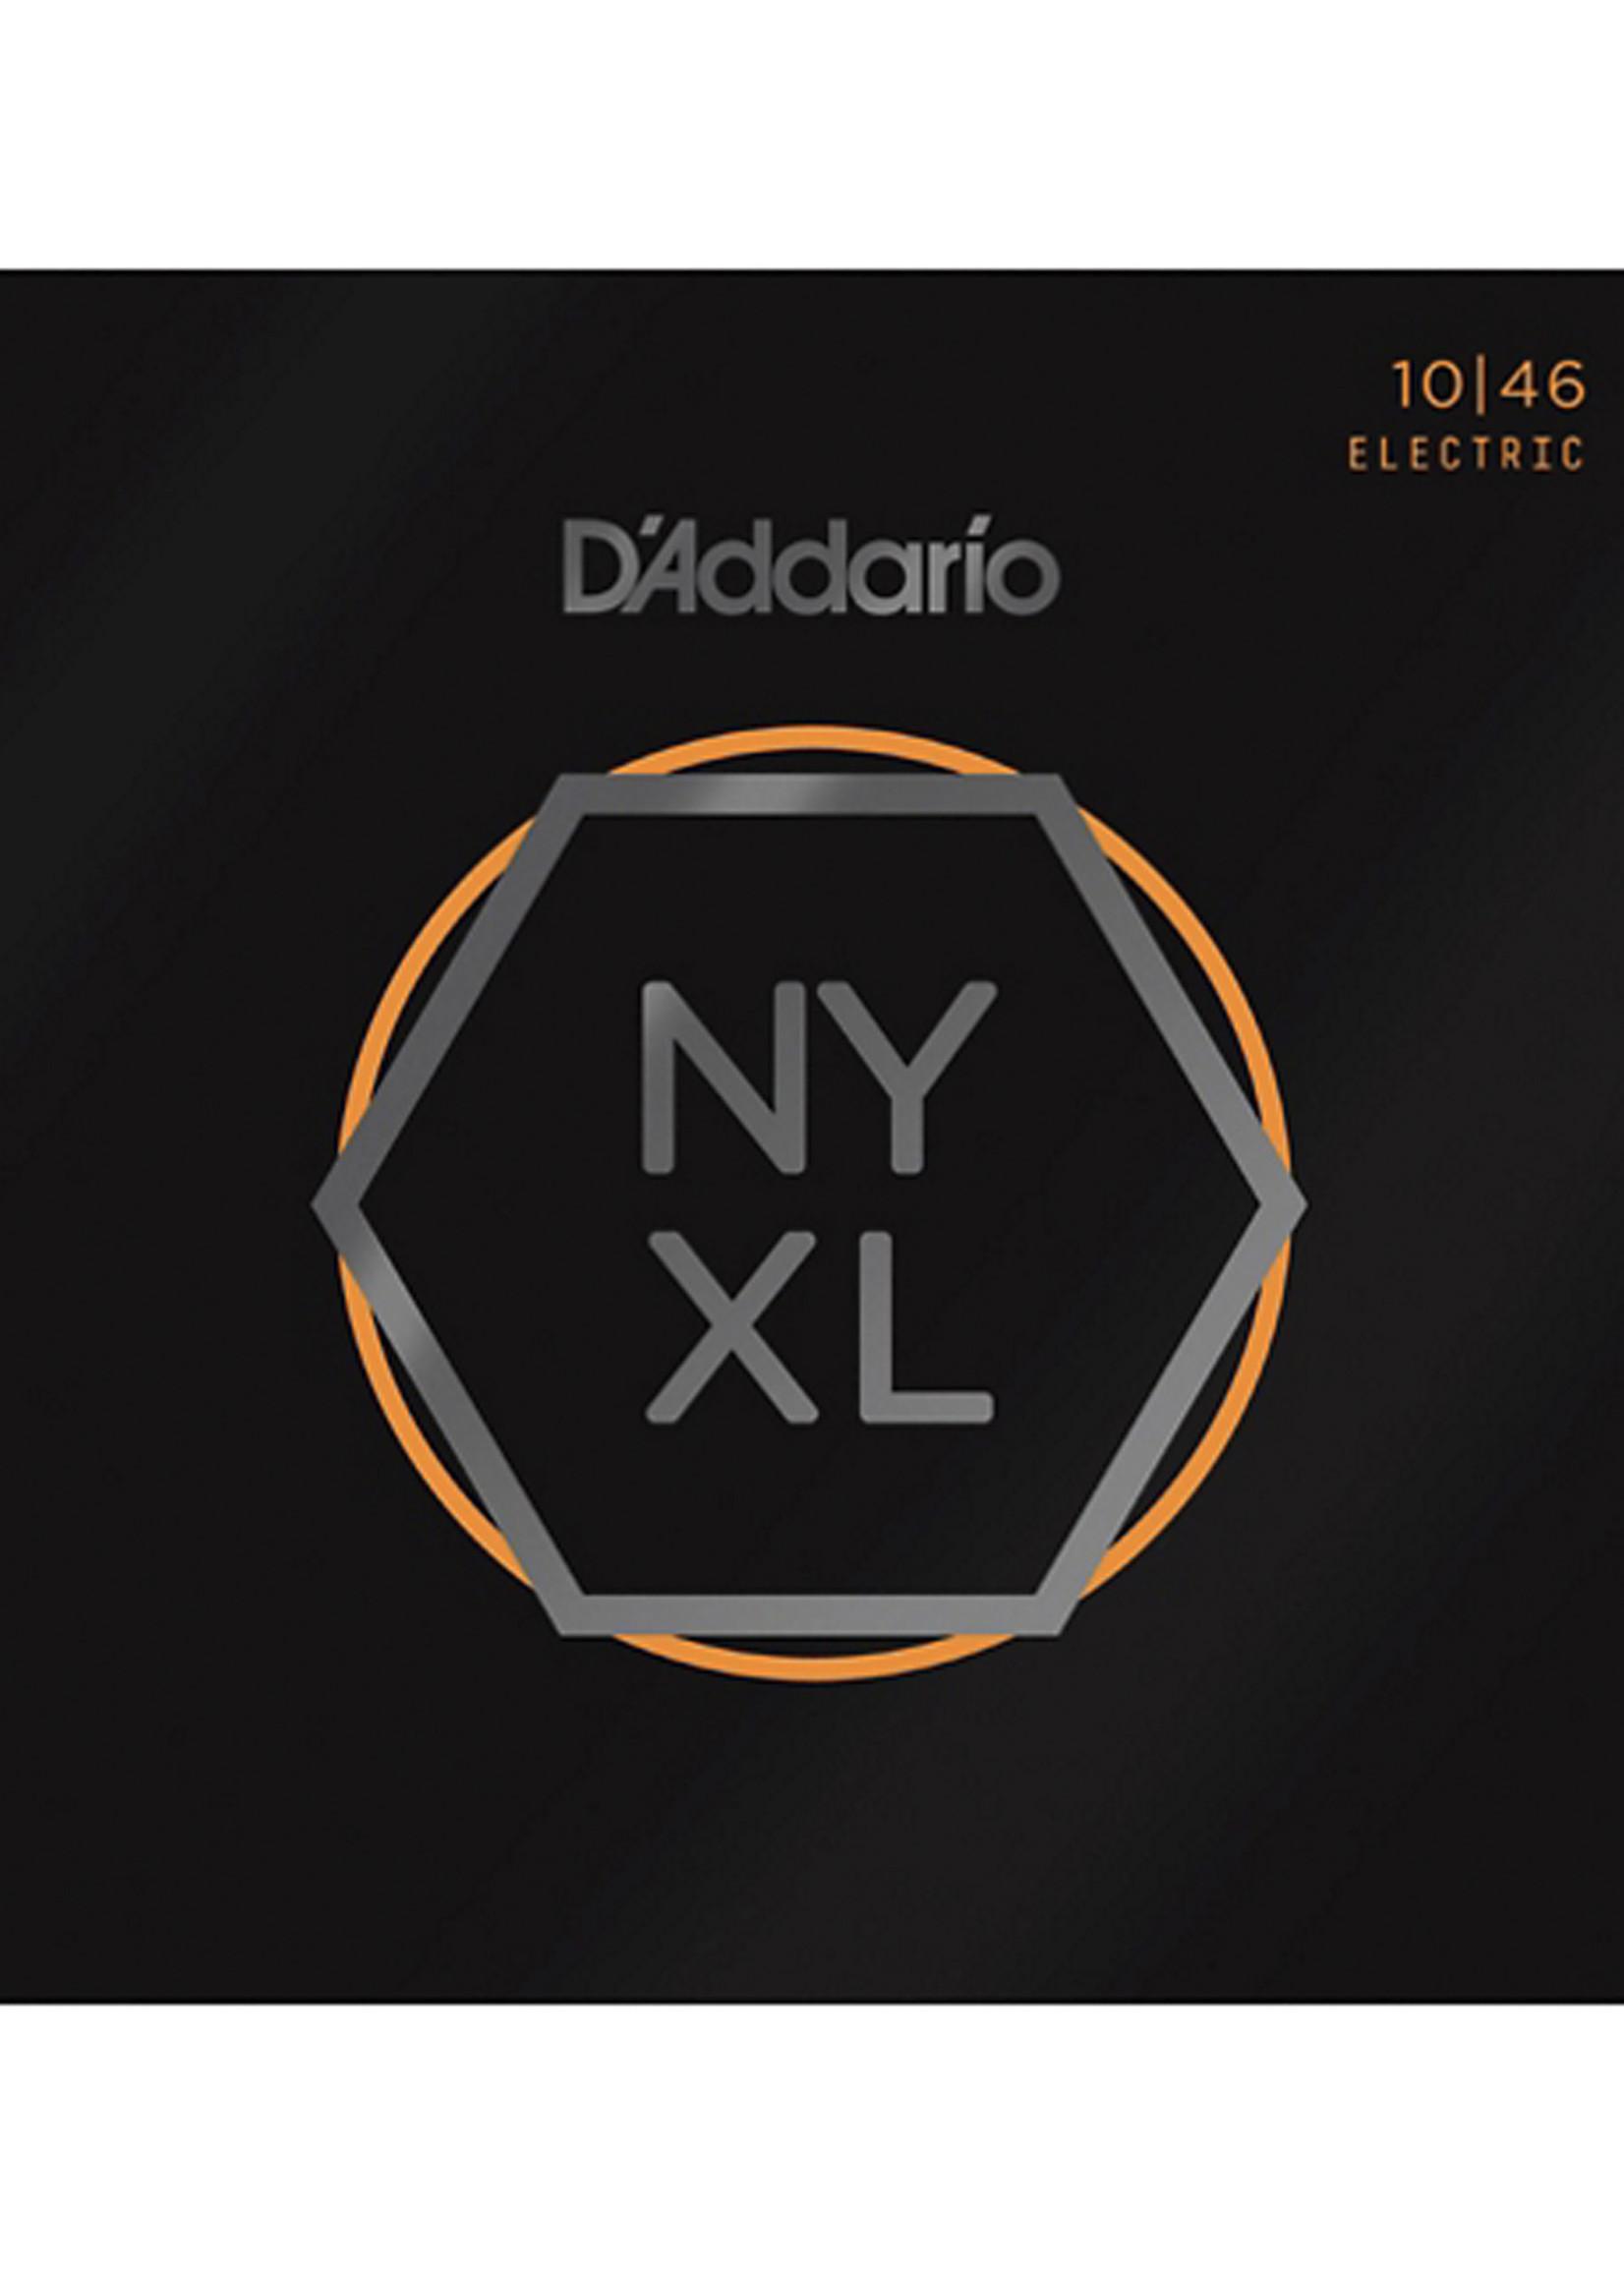 DAddario Fretted D'Addario NYXL 10-46 Regular Light